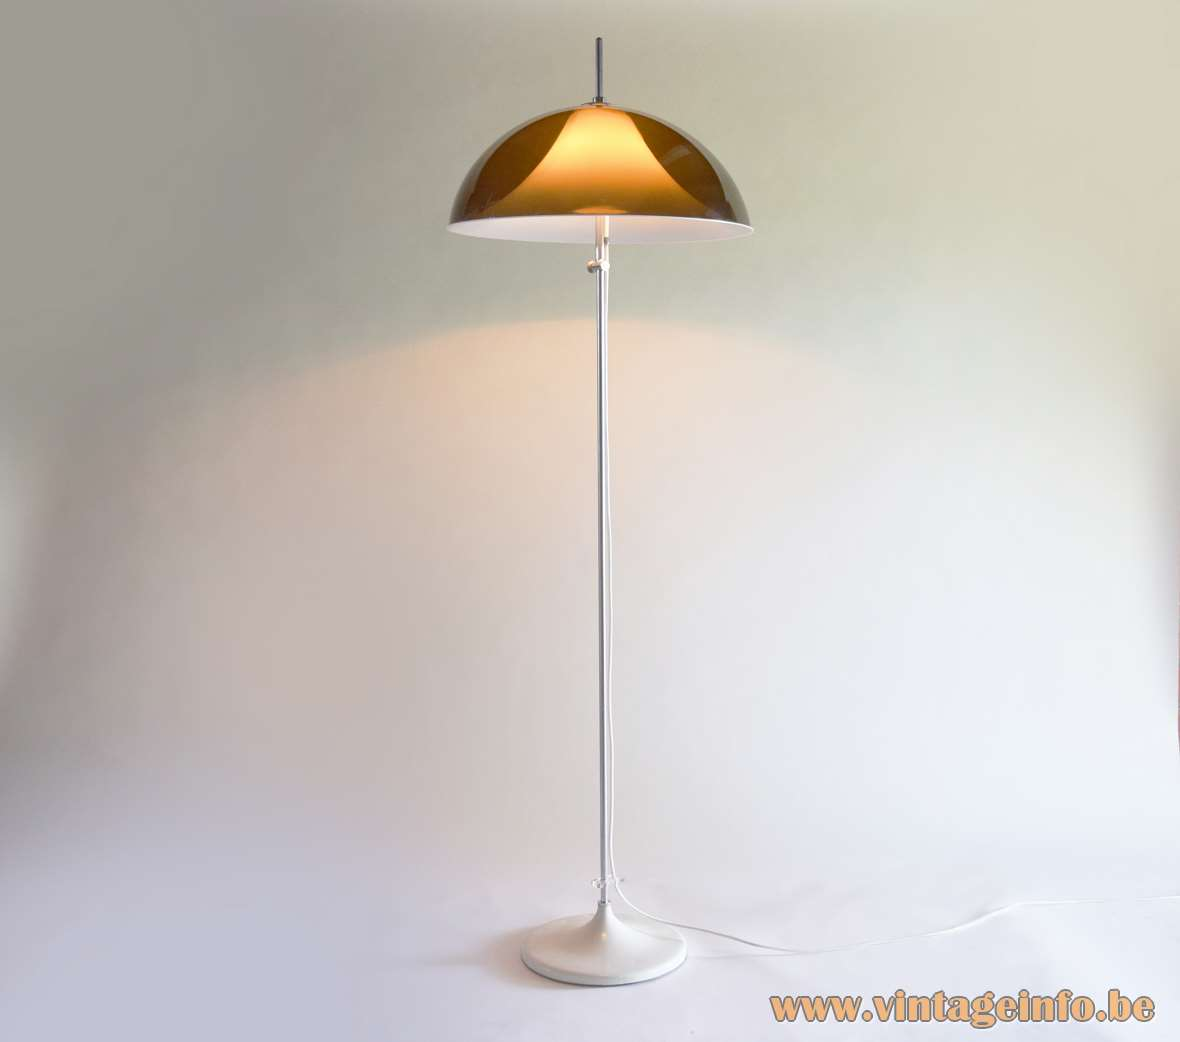 Artimeta acrylic floor lamp brown translucent mushroom lampshade white diffuser chrome rod round base 1960s 1970s